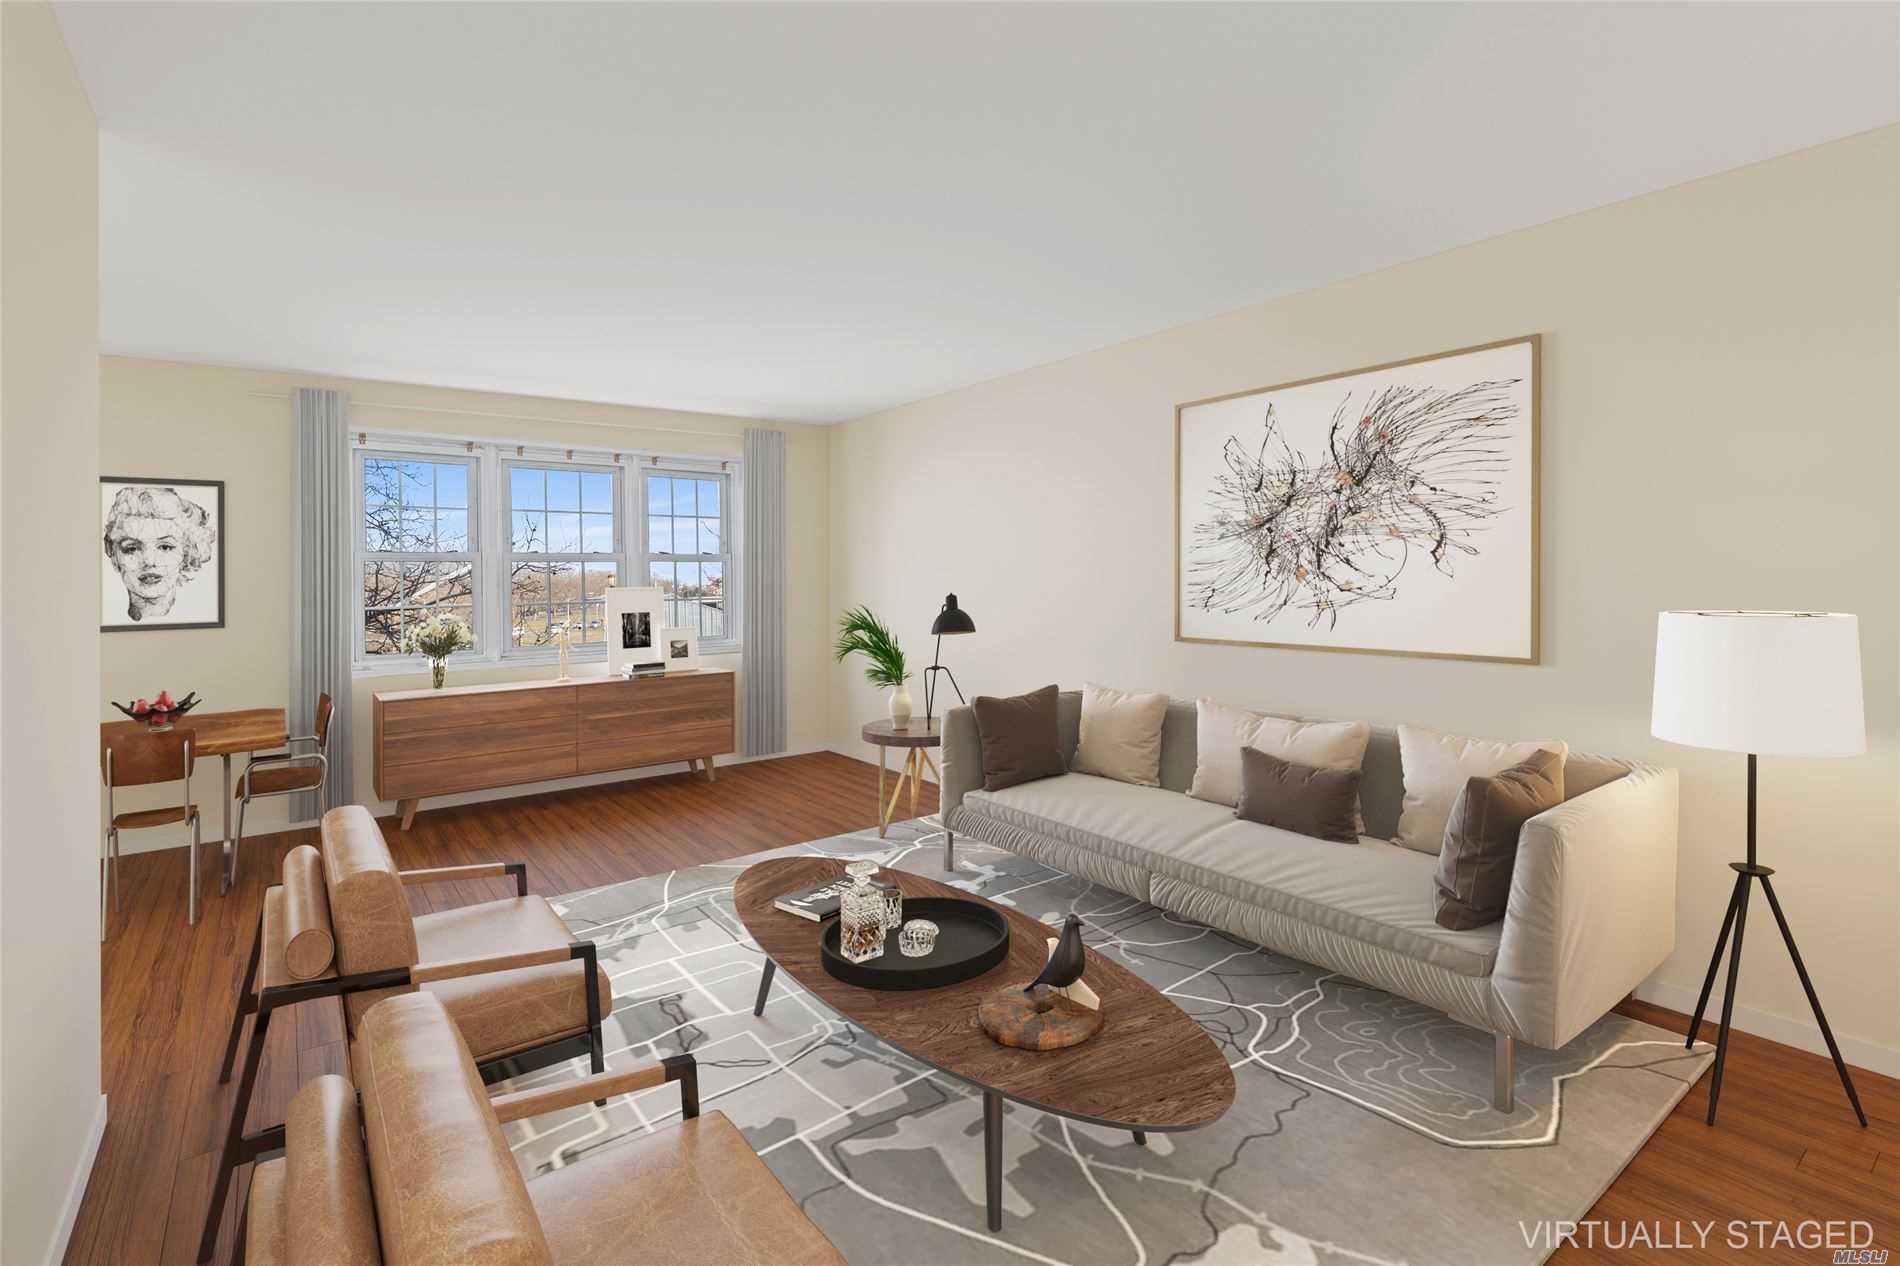 Property for sale at 87-10 149th Avenue # 3L, Howard Beach NY 11414, Howard Beach,  New York 11414